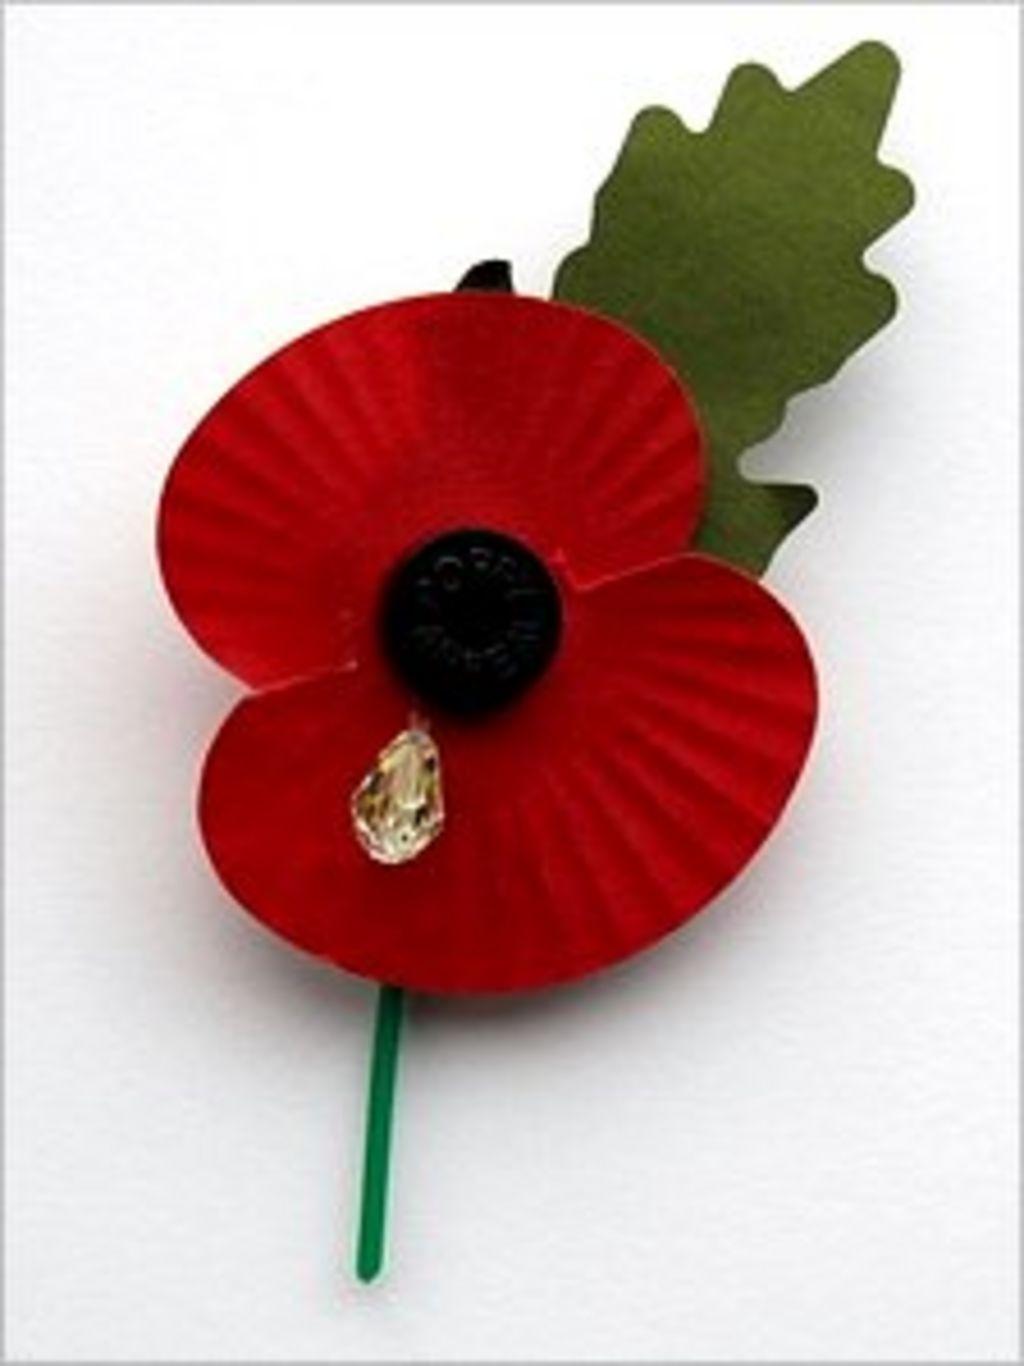 Wiltshire Womans Poppy Teardrop Violates Trademark Bbc News